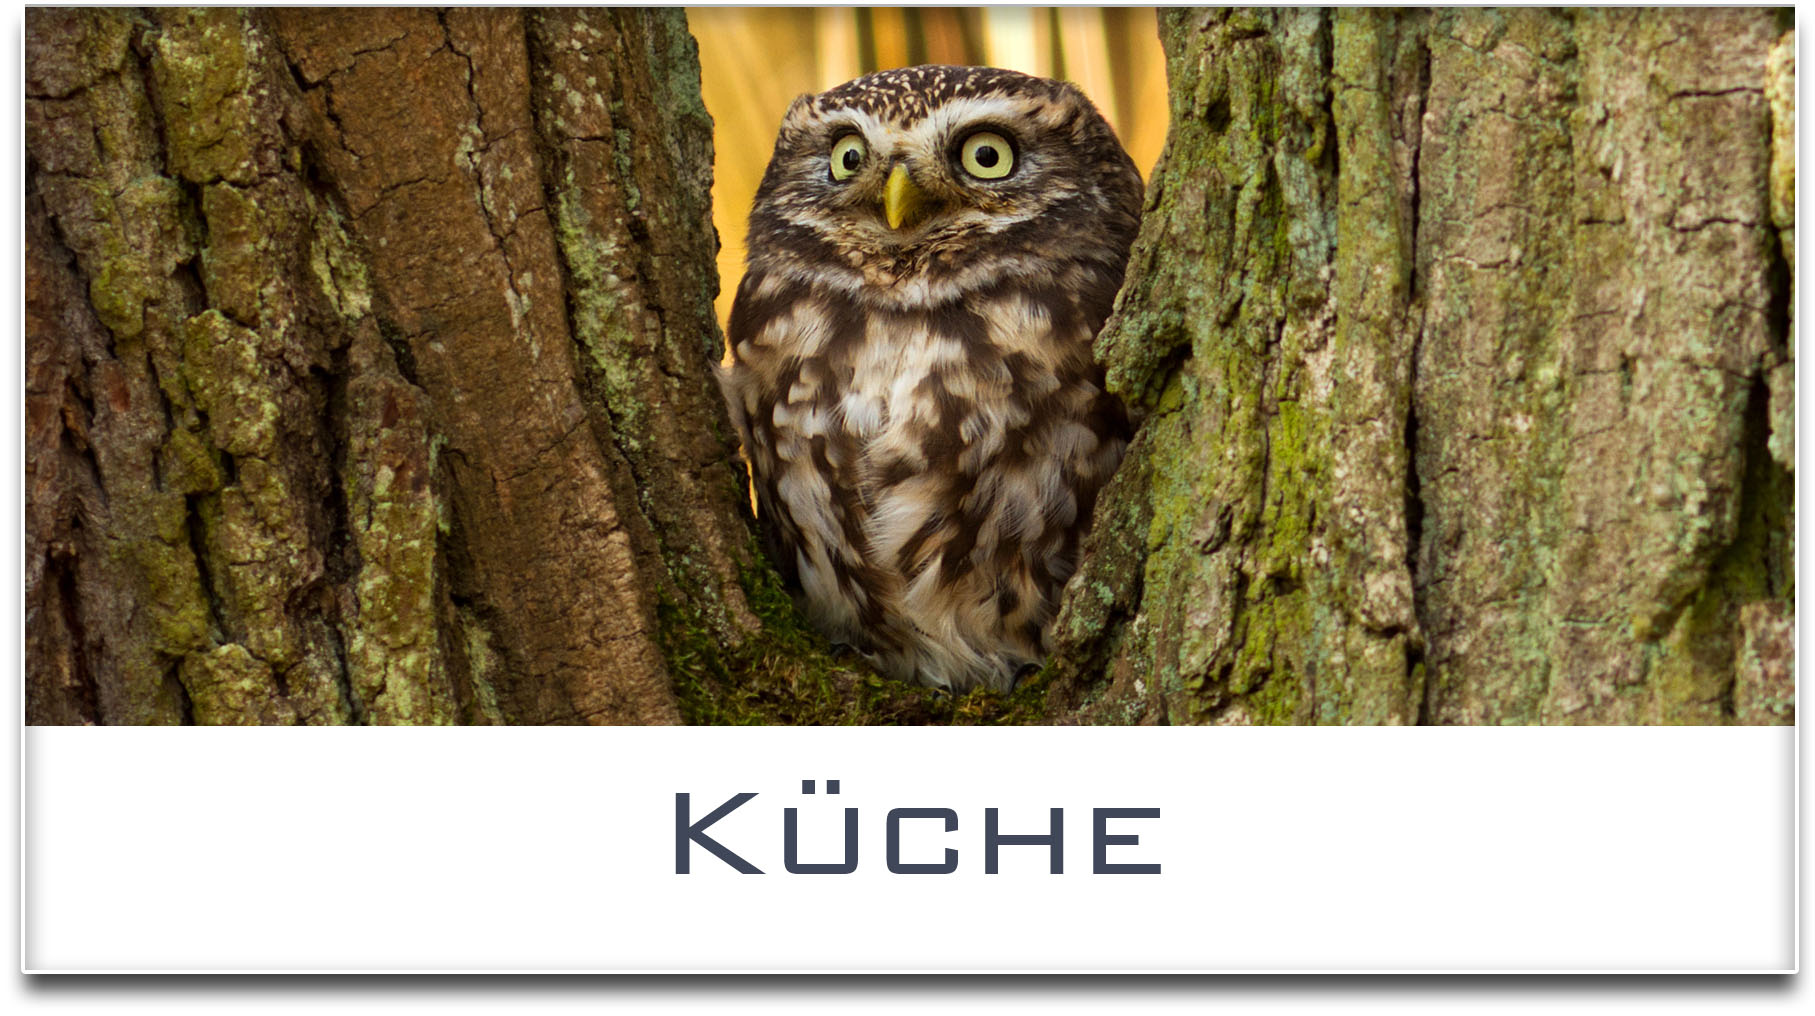 Türschild / Haustürschild / Eule / Küche / Selbstklebend